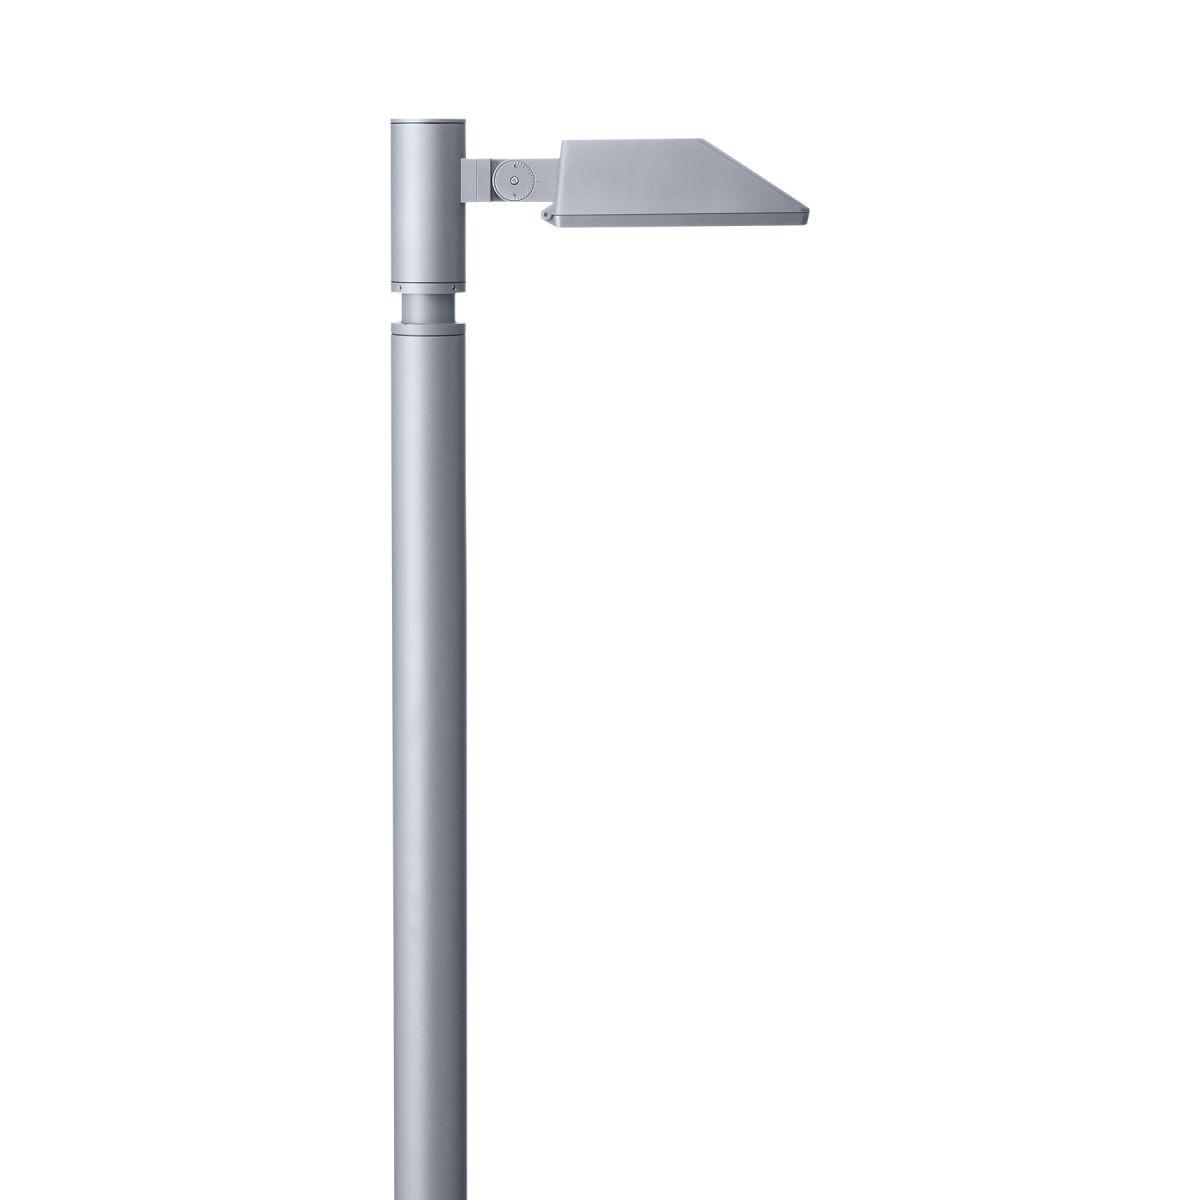 Small SIROCCO Optic - Area Light / Asymmetric Single Sided